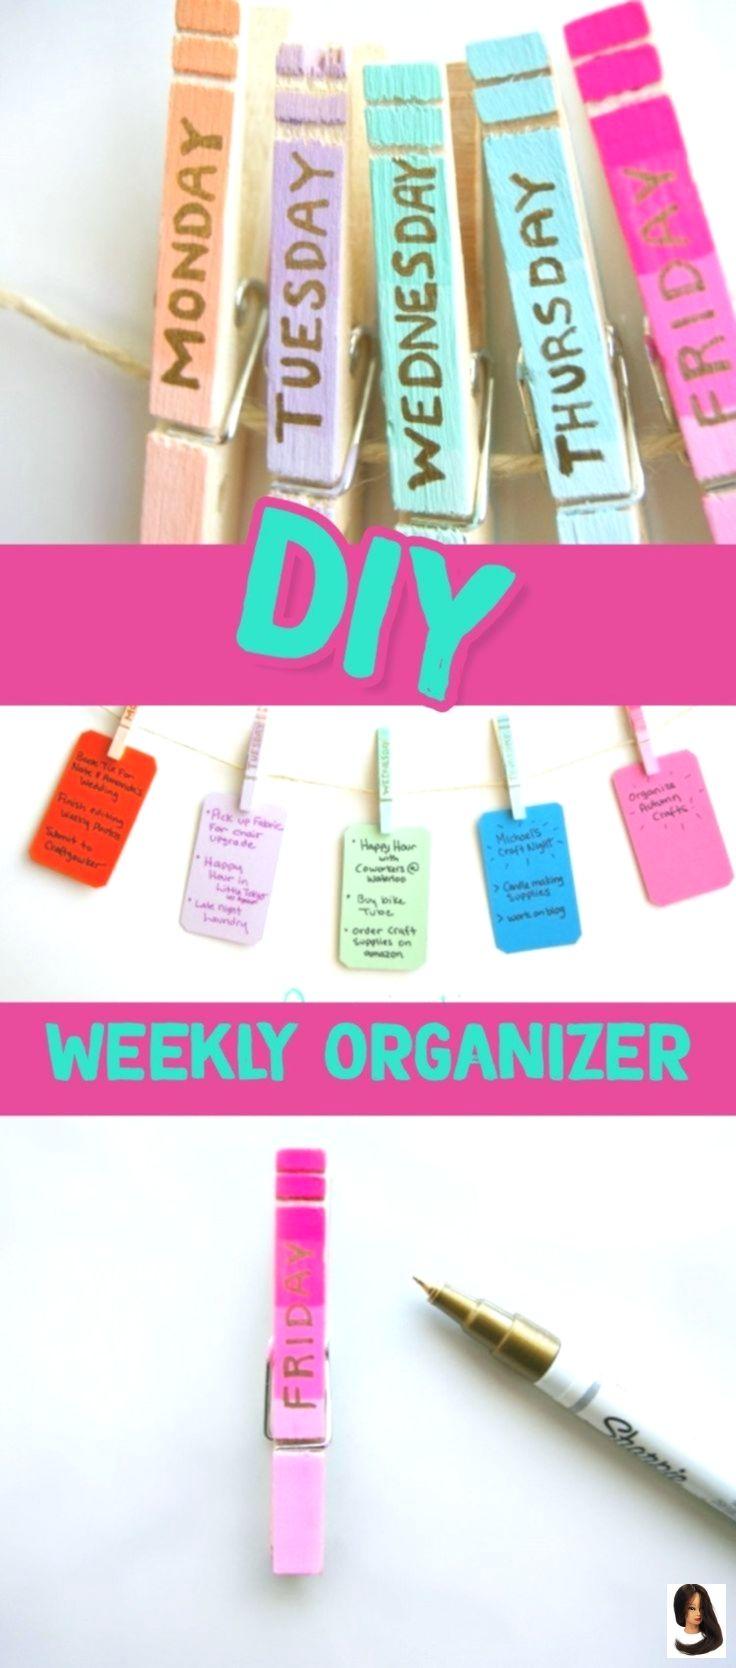 DIY Dorm Room Ideas - Dorm Decorating Ideas PICTURES for 2019 #organizingdormrooms